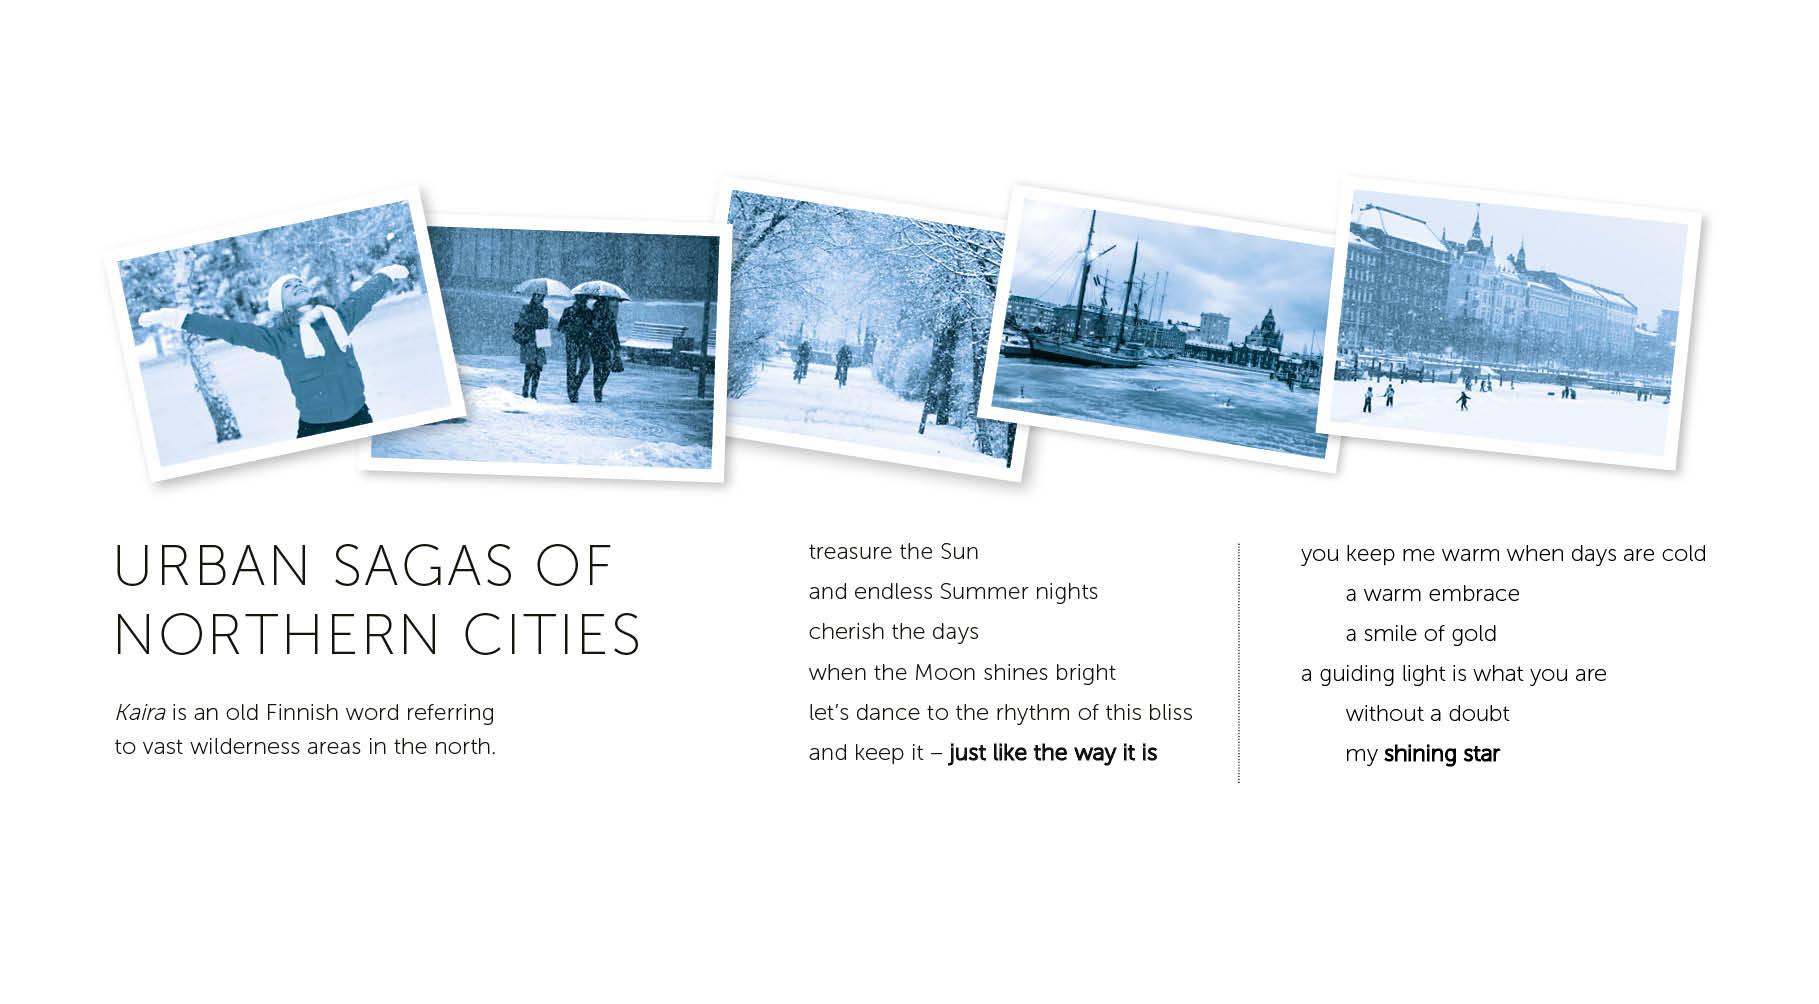 Poems By Emma Larsson, the Swedish born NewYorker who writes our lyrics.